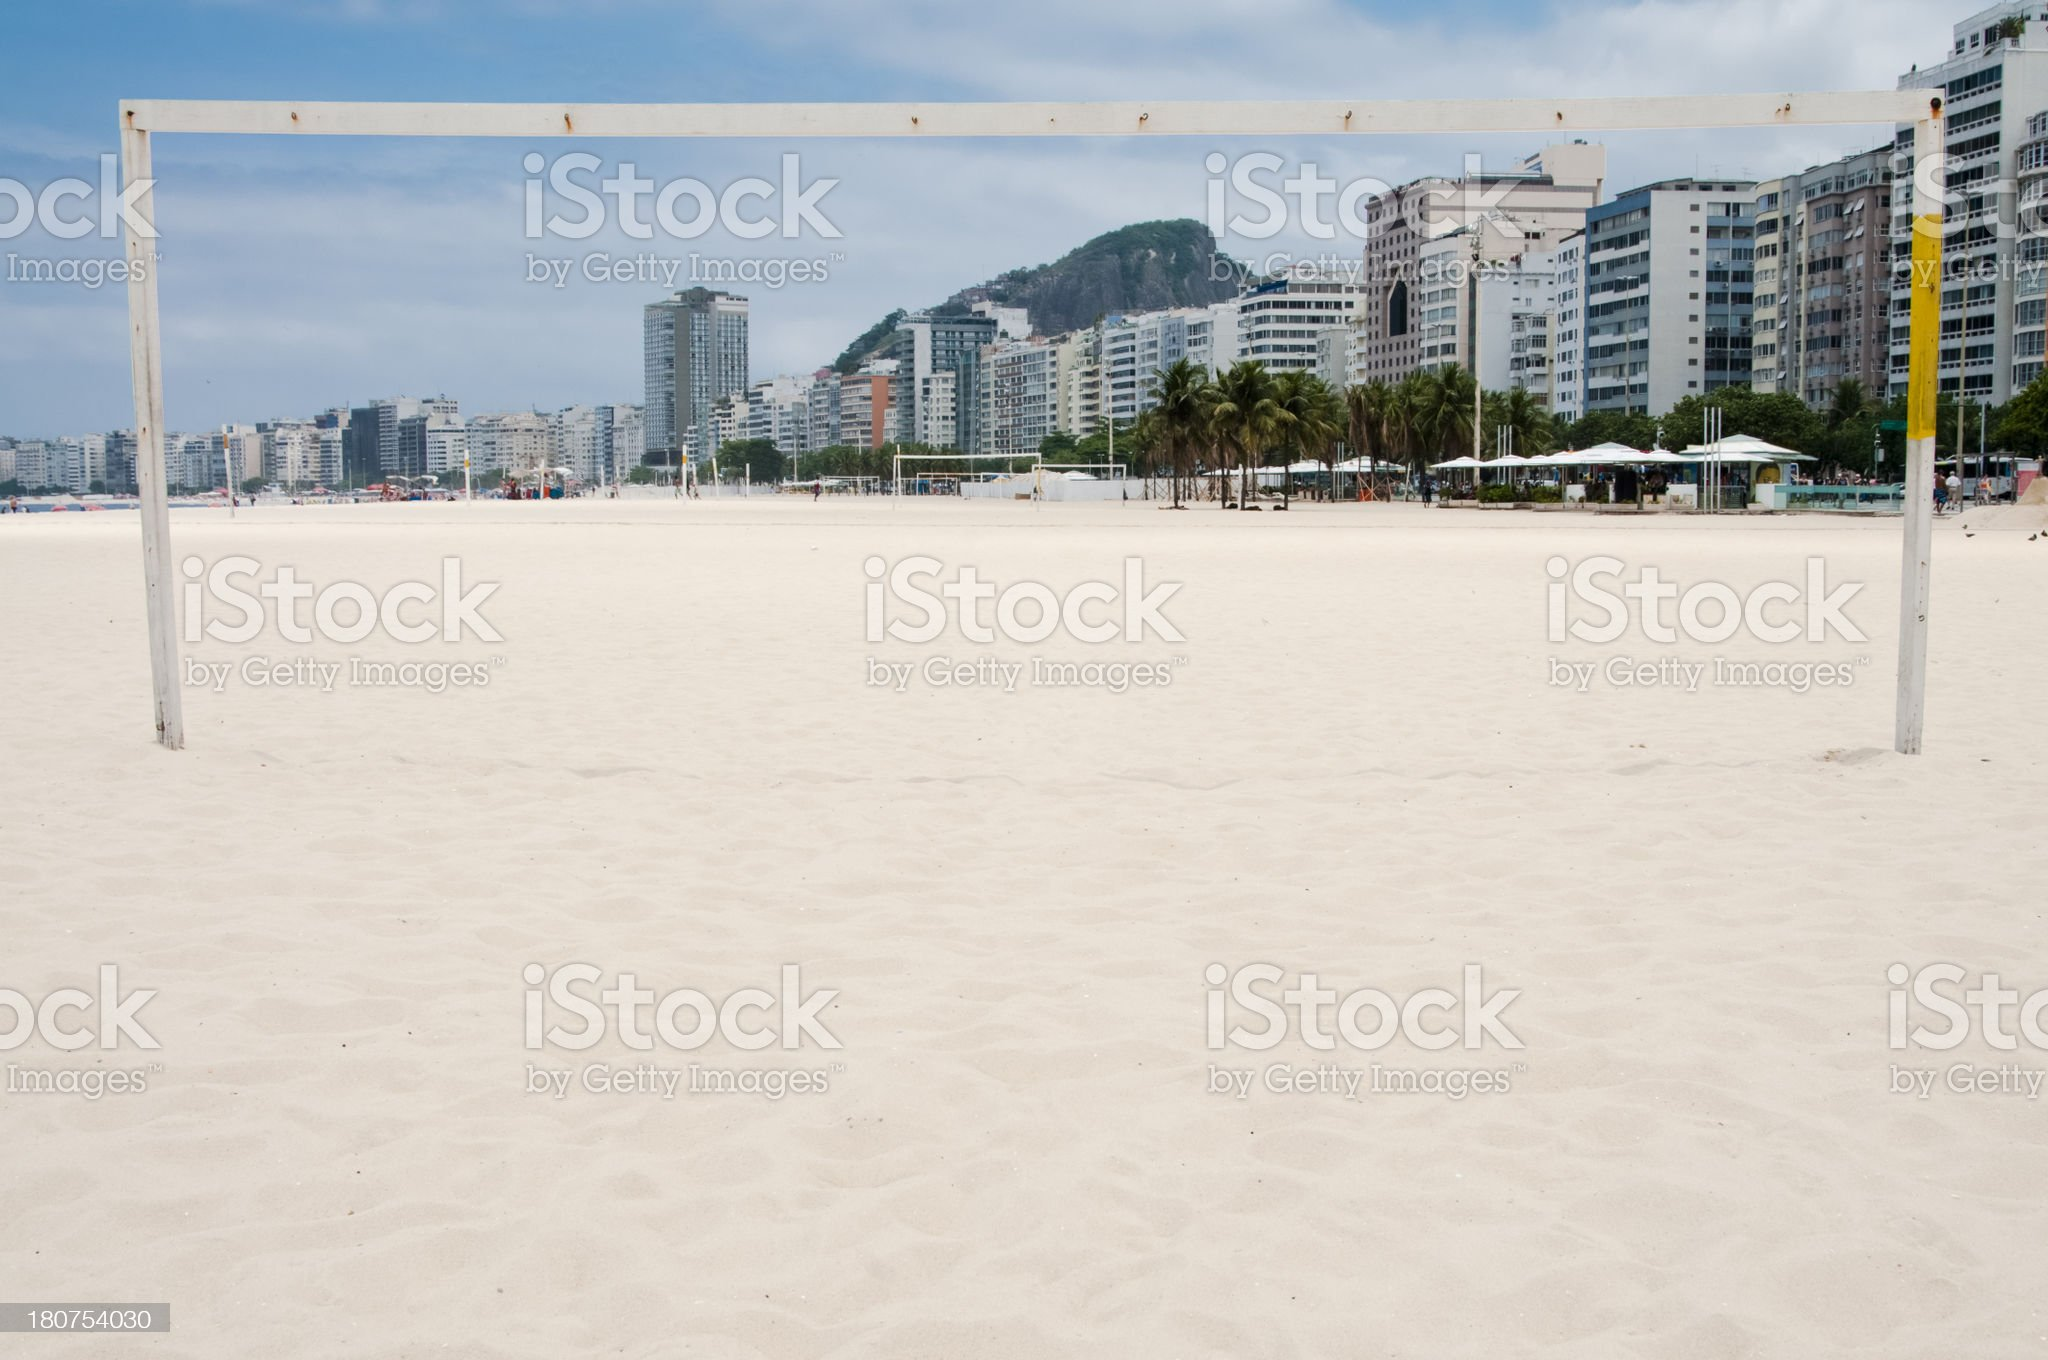 Football Goal Over looking Condominiums, Copacabana, Brazil. royalty-free stock photo